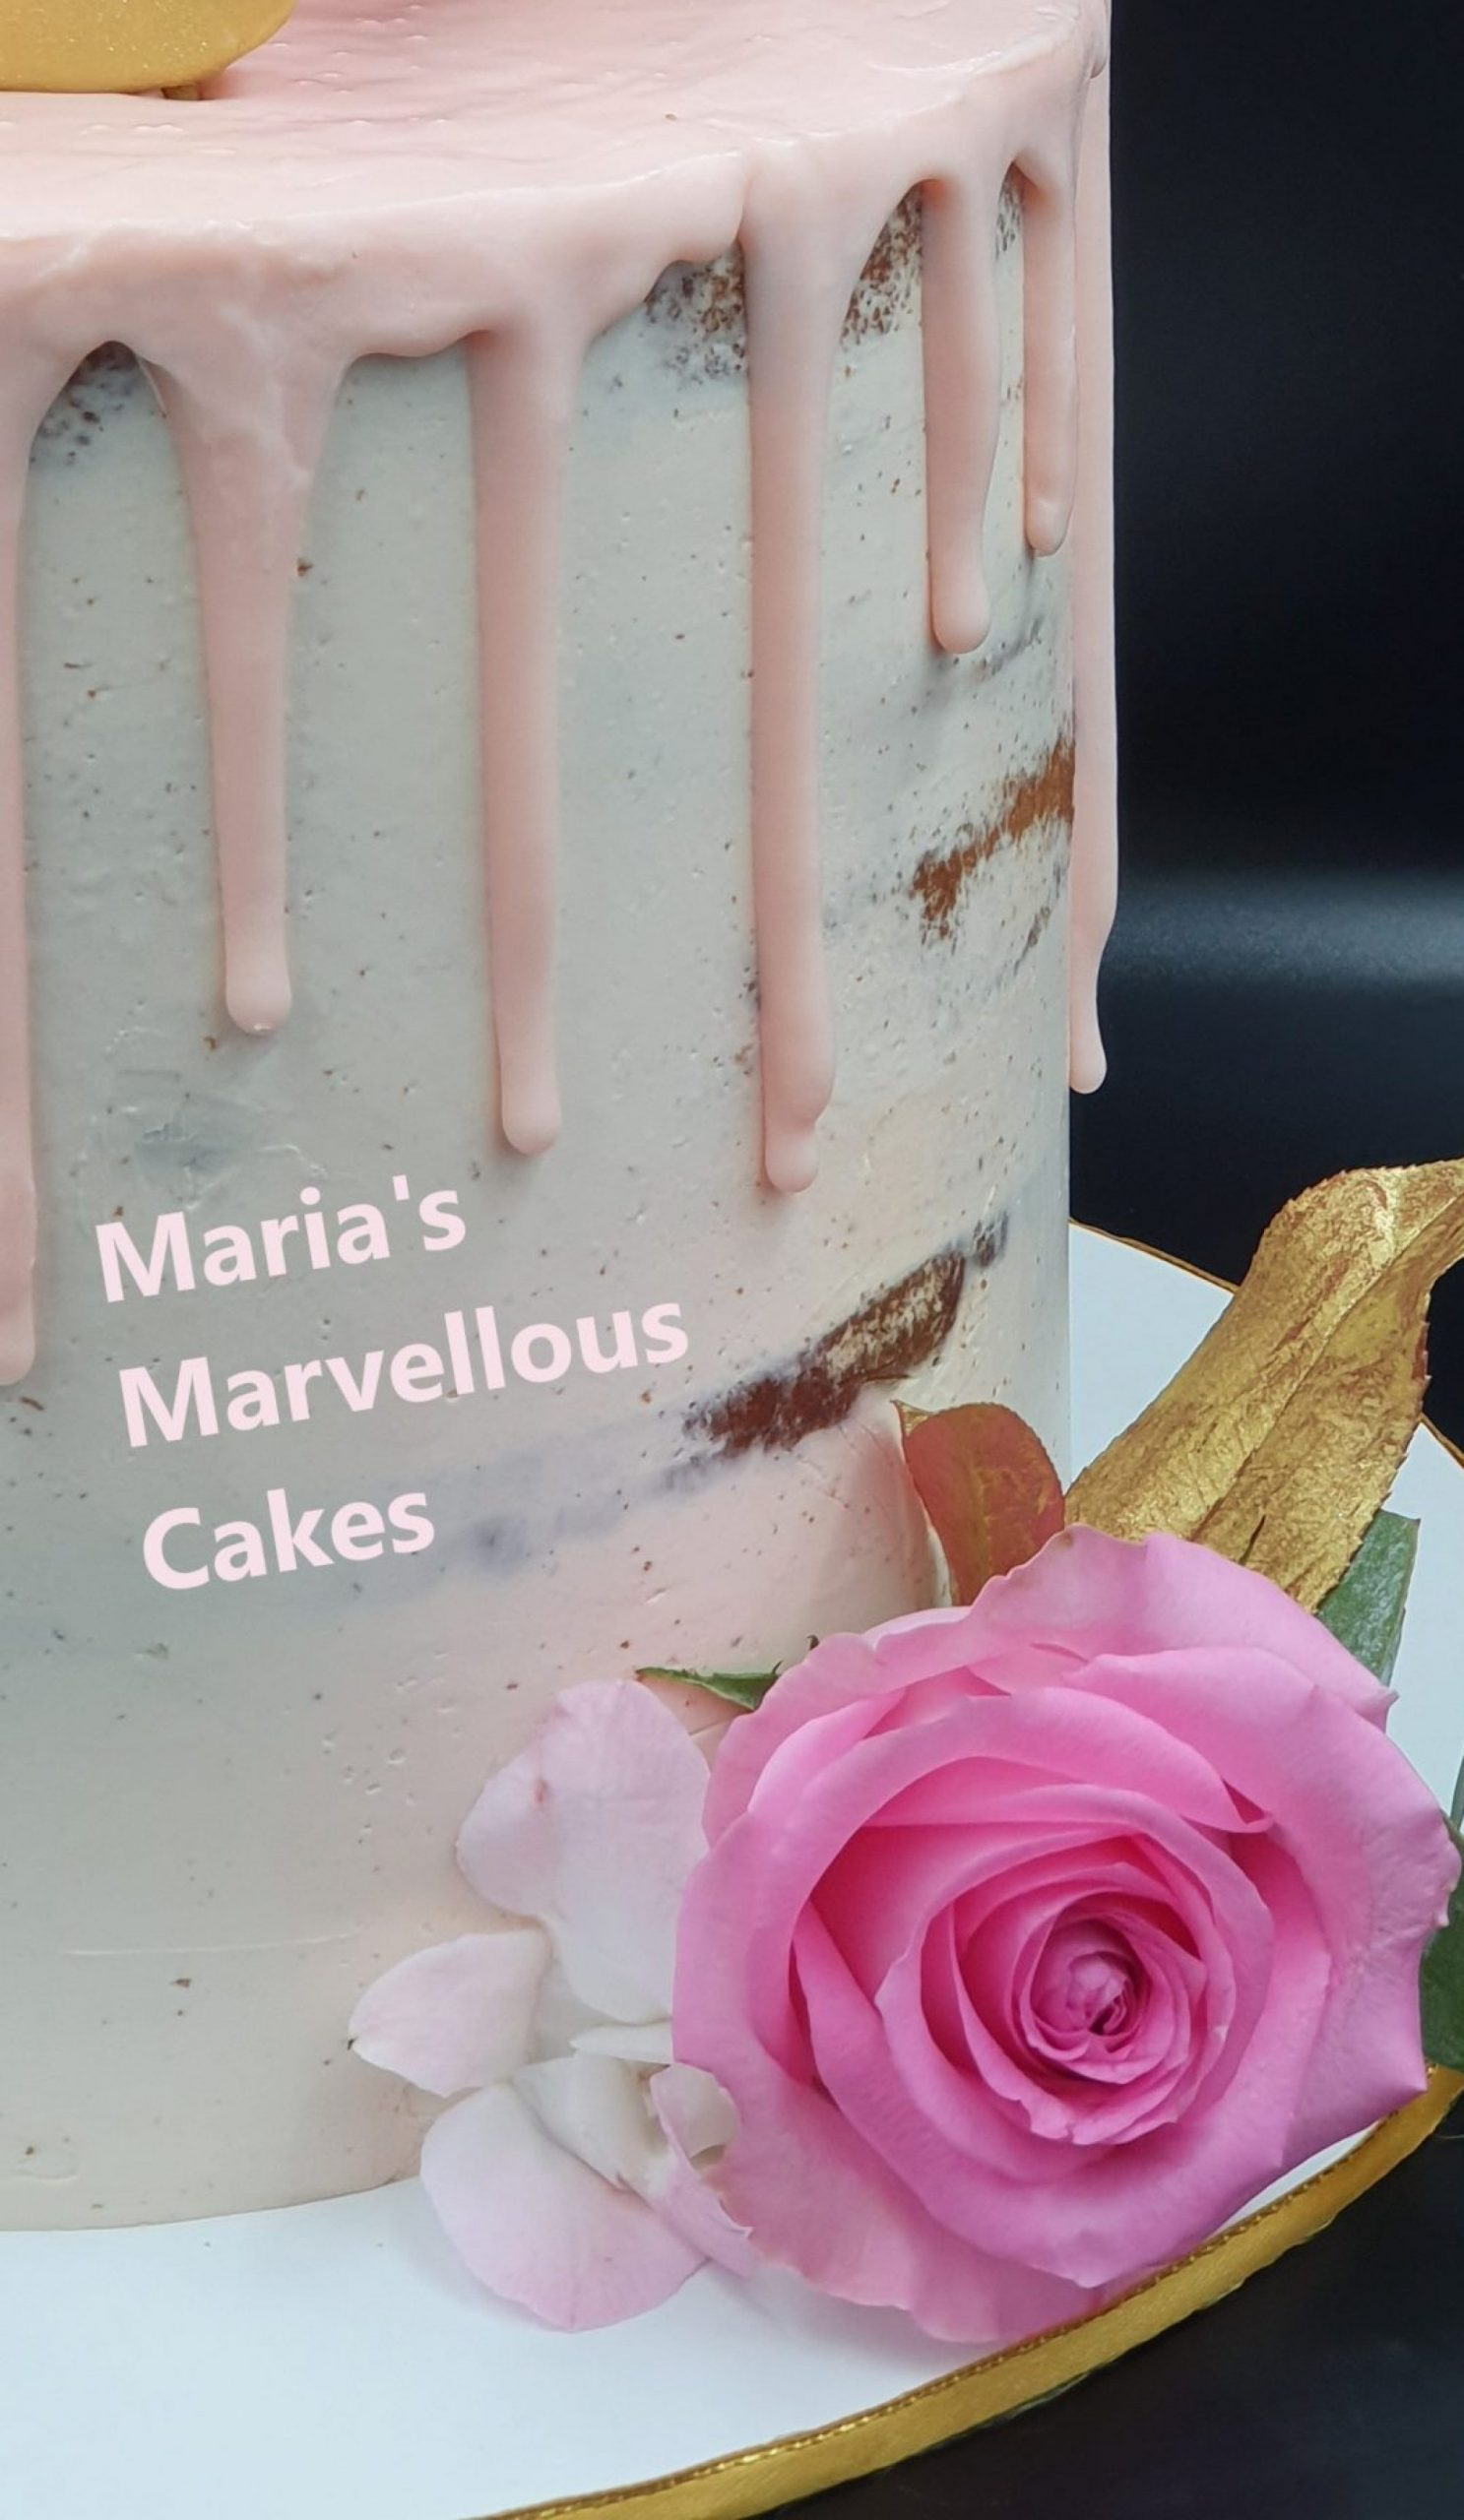 Maria's Marvellous Cakes